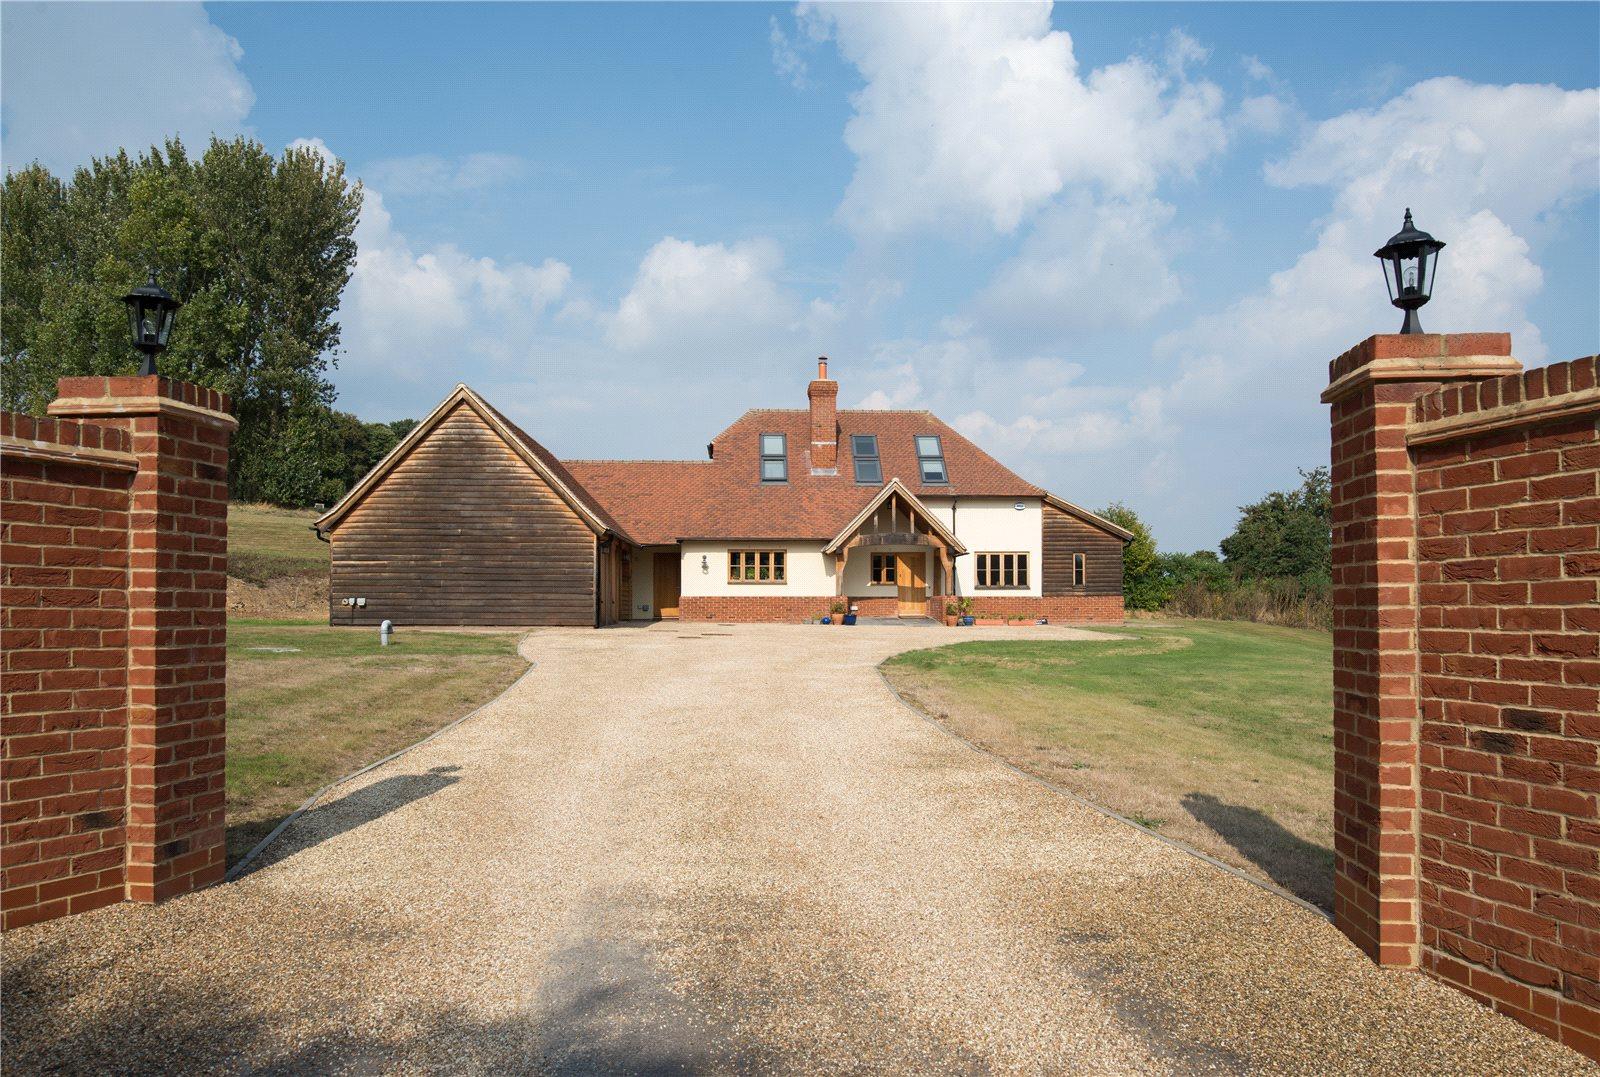 獨棟家庭住宅 為 出售 在 Munsgore Lane, Borden, Sittingbourne, Kent, ME9 Sittingbourne, 英格蘭